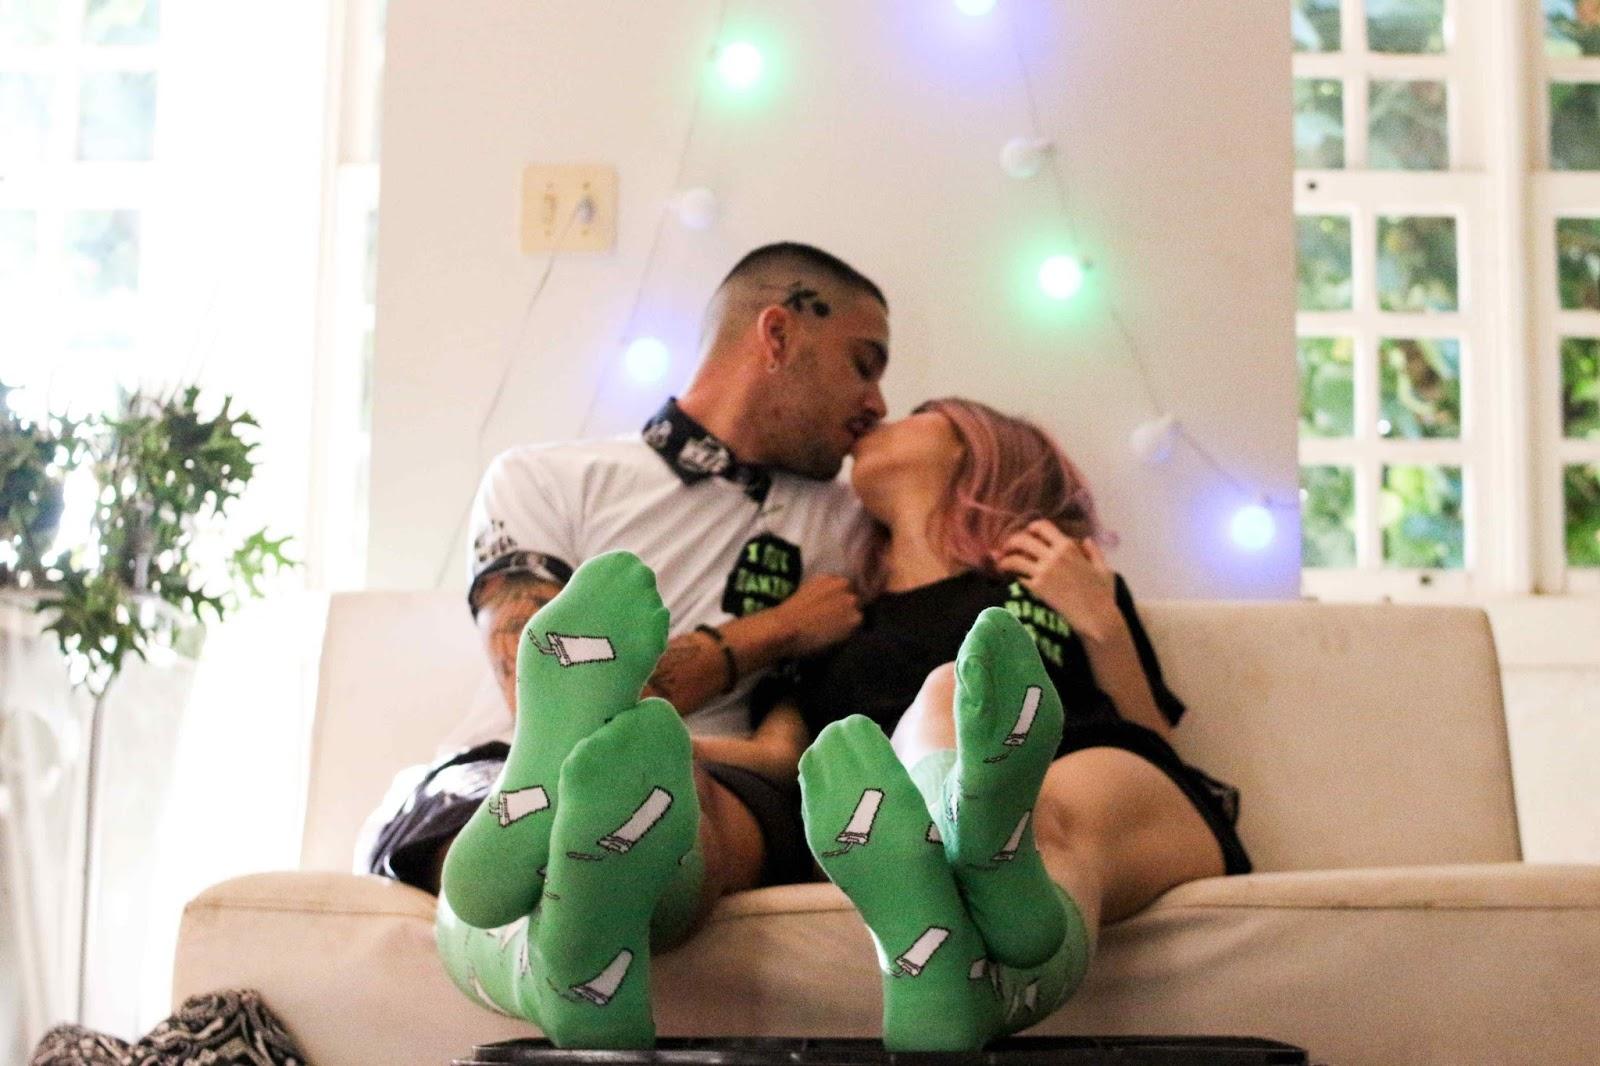 feed the feet nephew parceria 03 - Nephew e Feed The Feet mergulham no universo pop americano